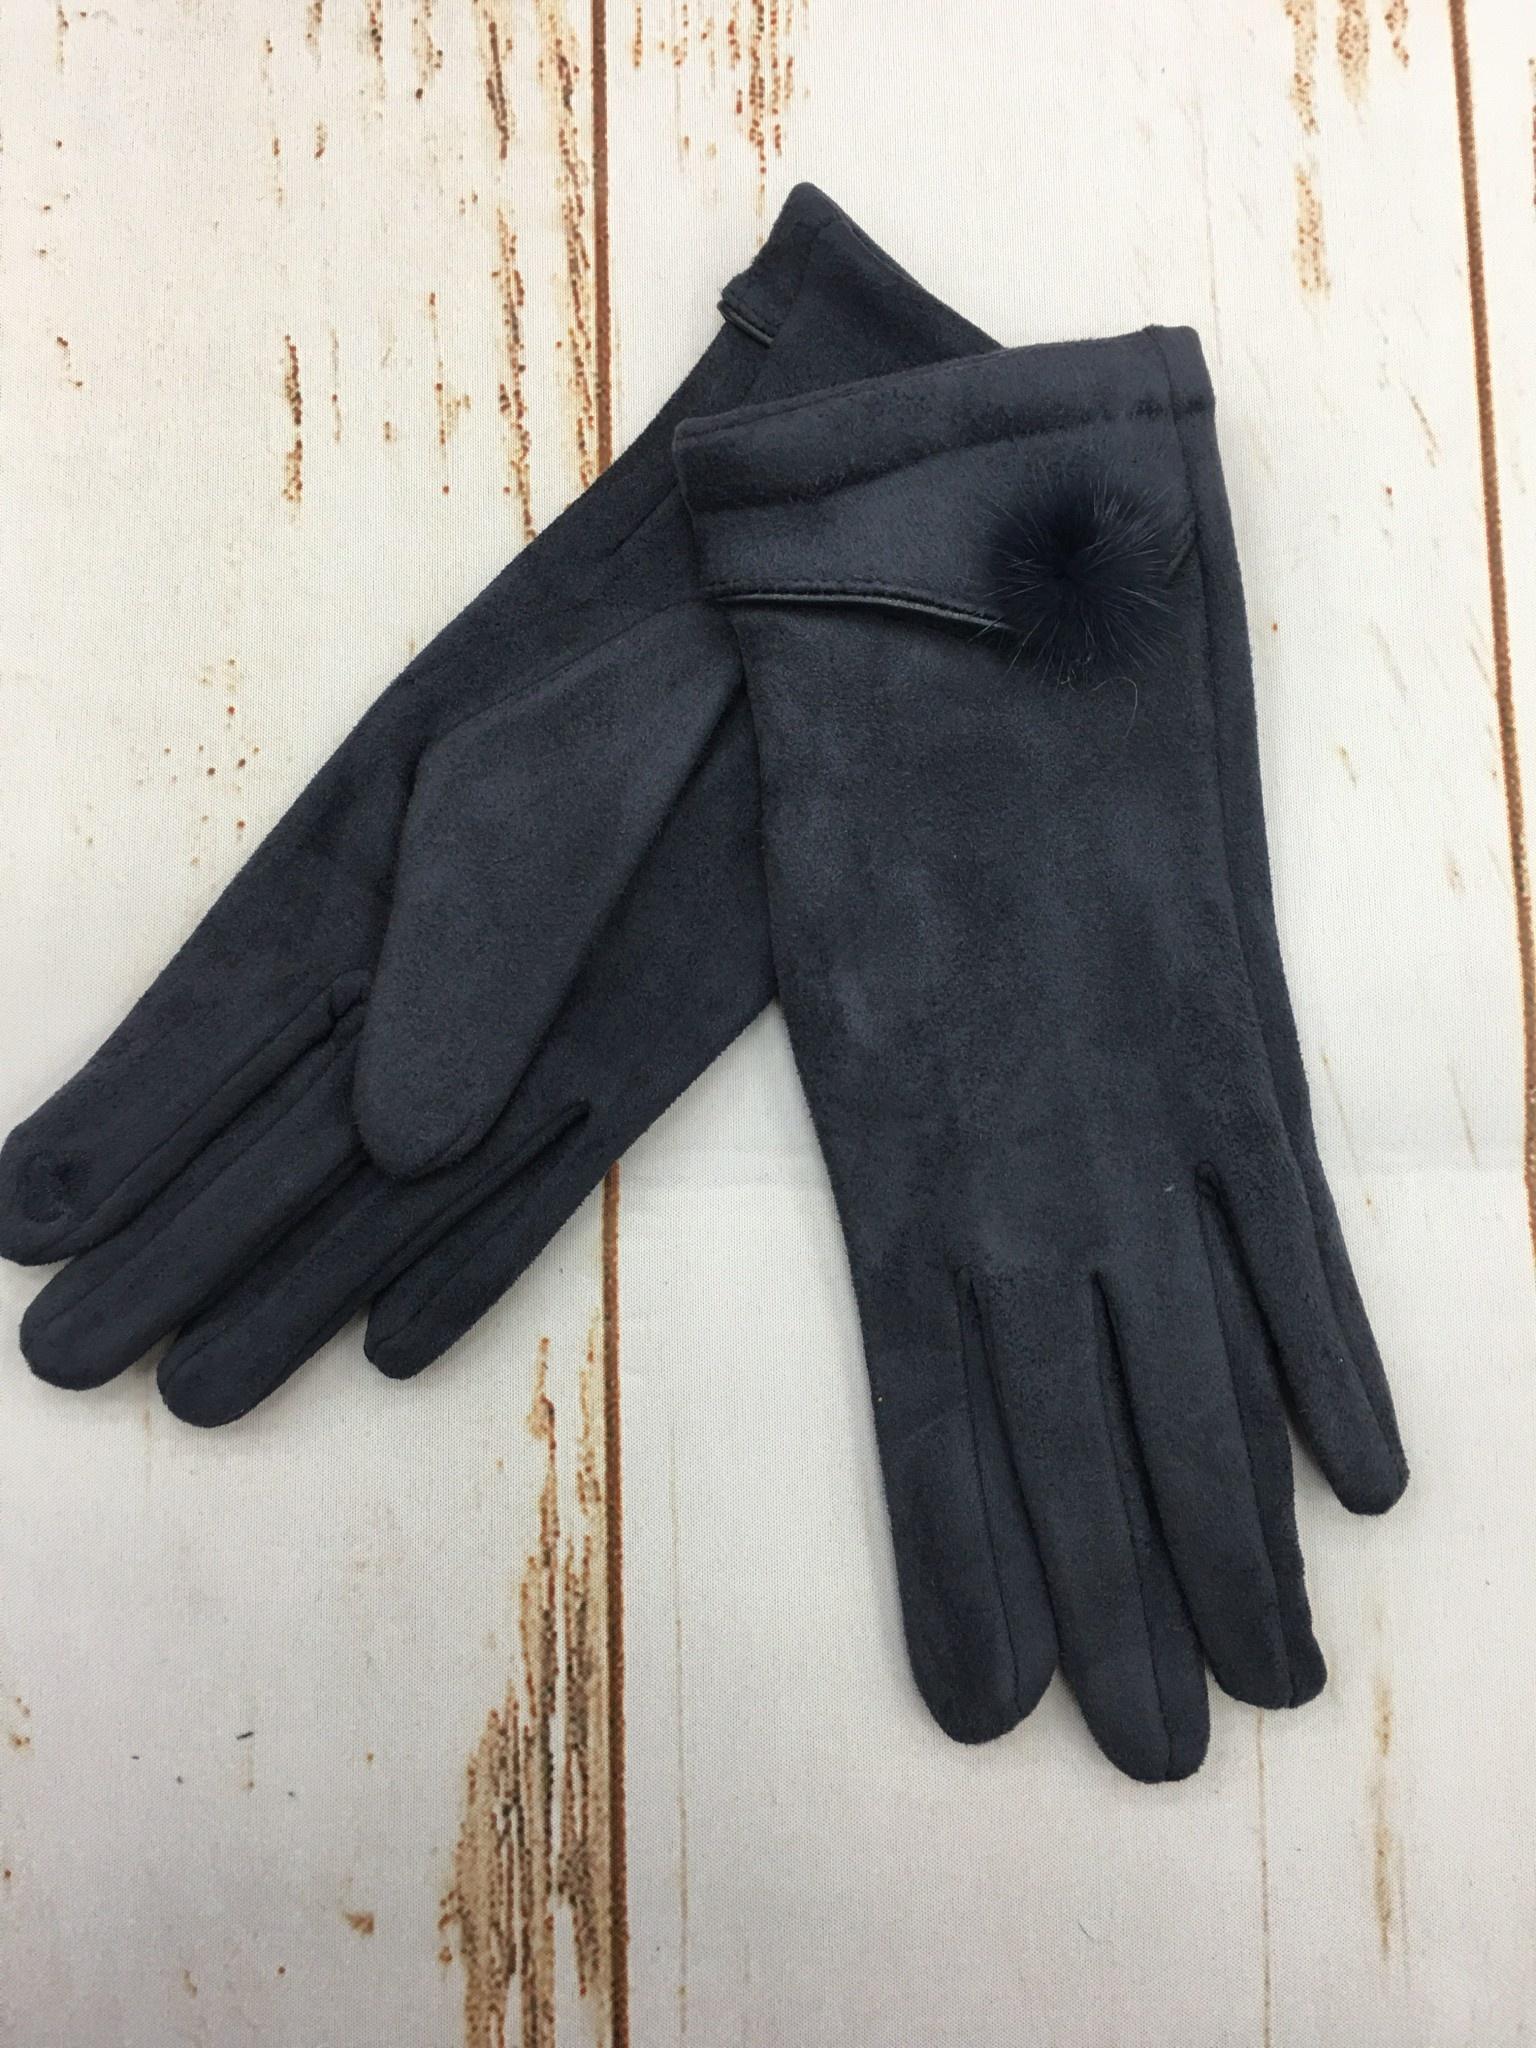 Top It Off Suede Glove W/Pom in Navy